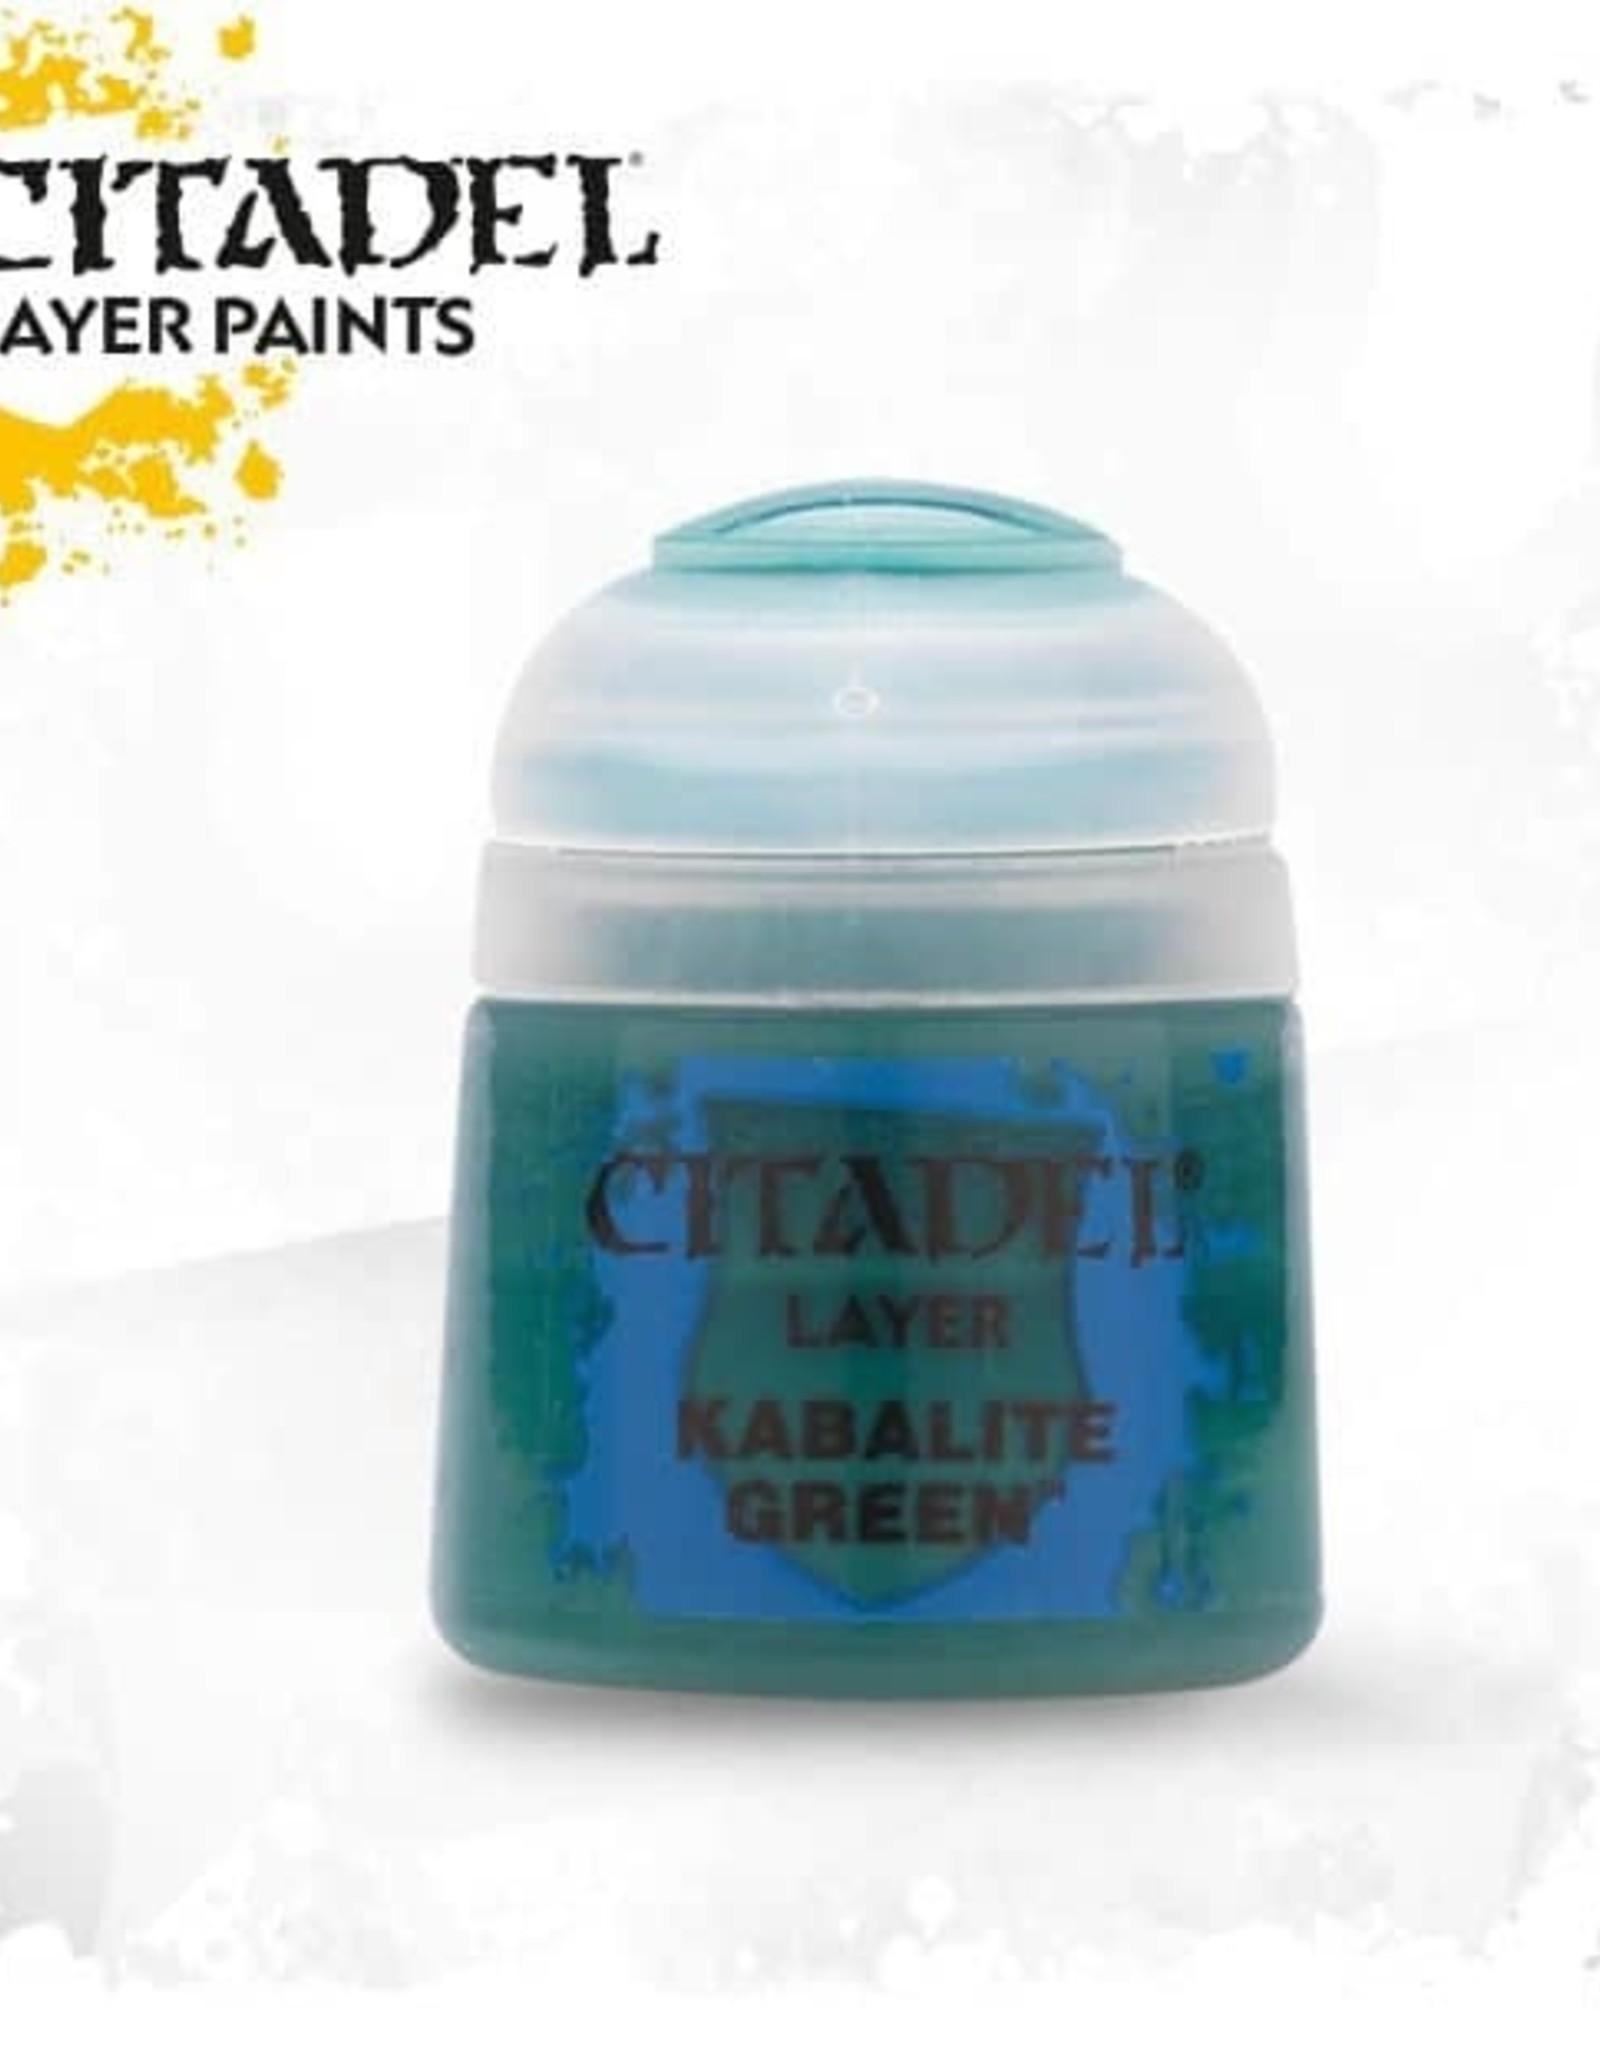 Games Workshop Citadel Paint: Layer - Kabalite Green